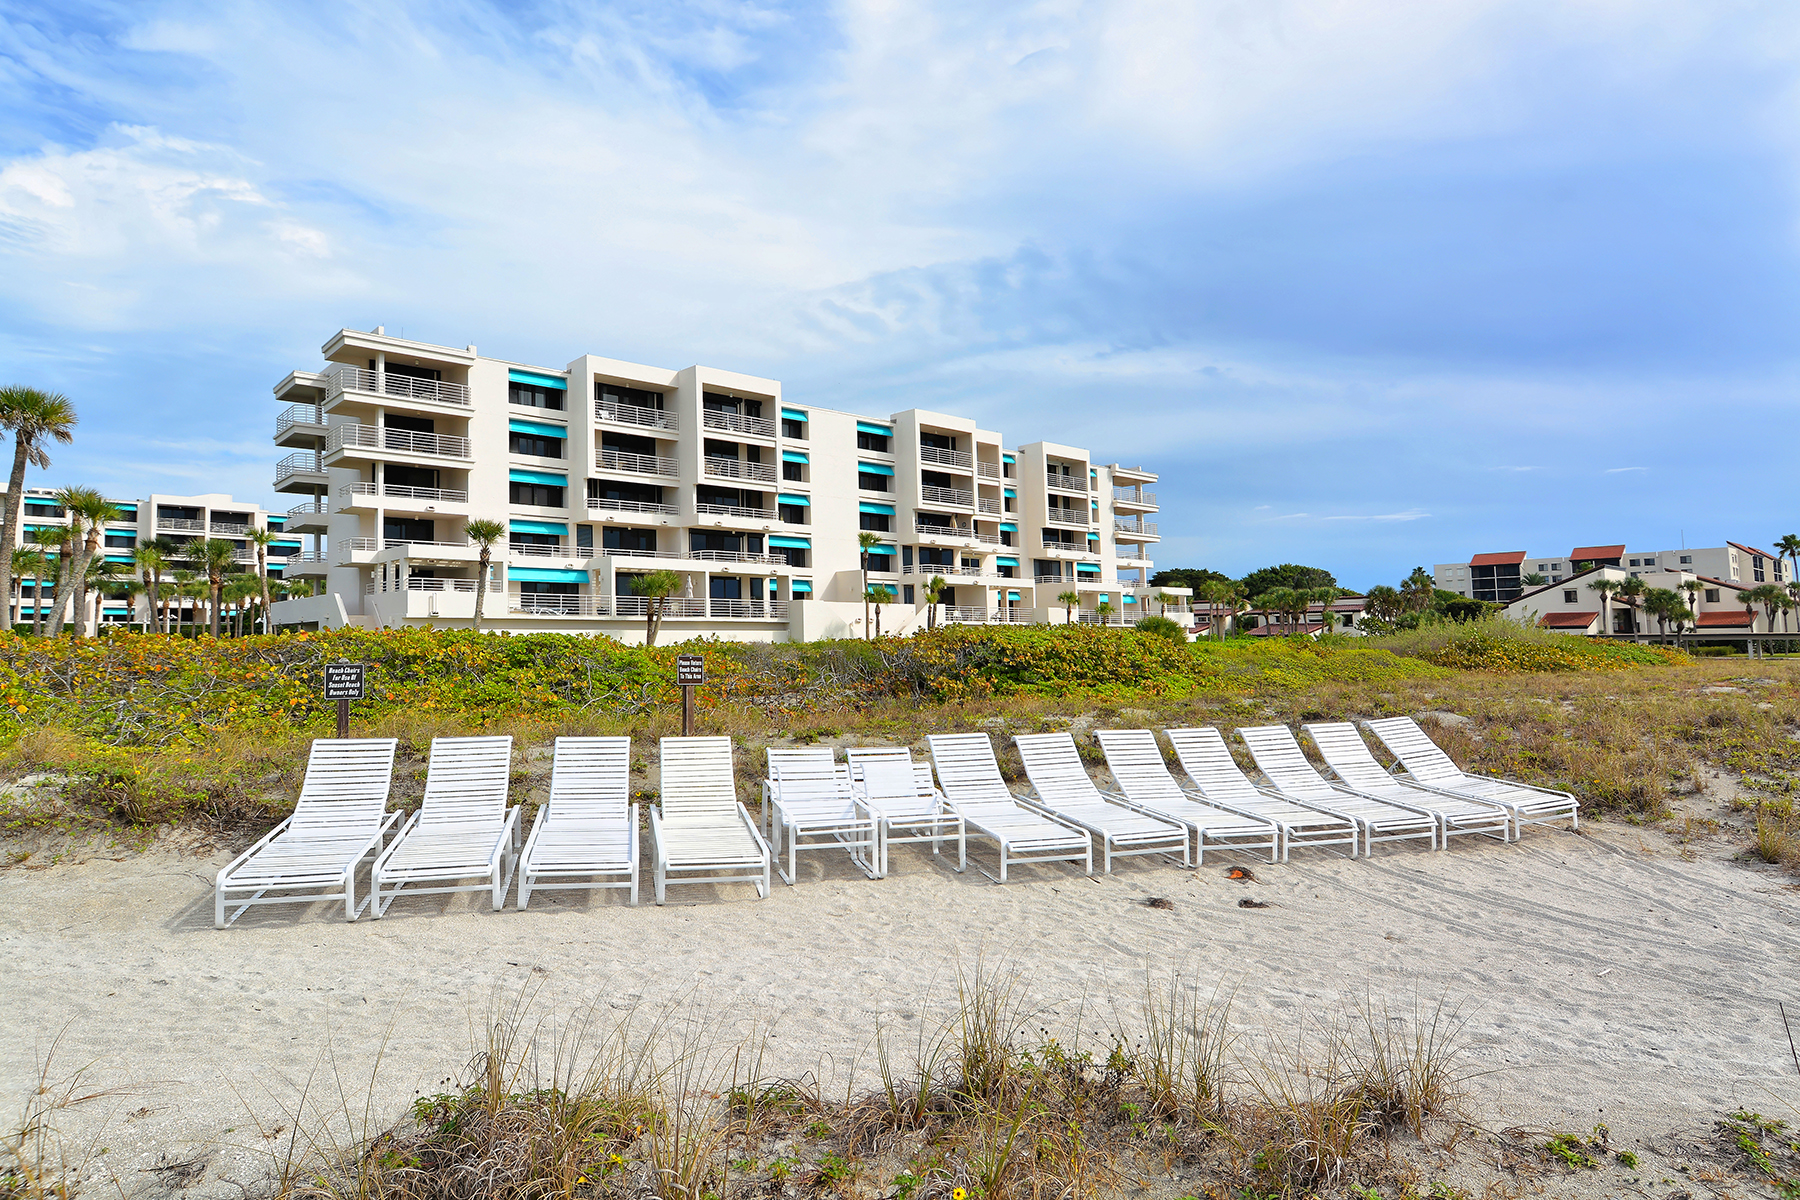 Condominium for Sale at SUNSET BEACH-LONGBOAT KEY 2105 Gulf Of Mexico Dr 3204 Longboat Key, Florida, 34228 United States